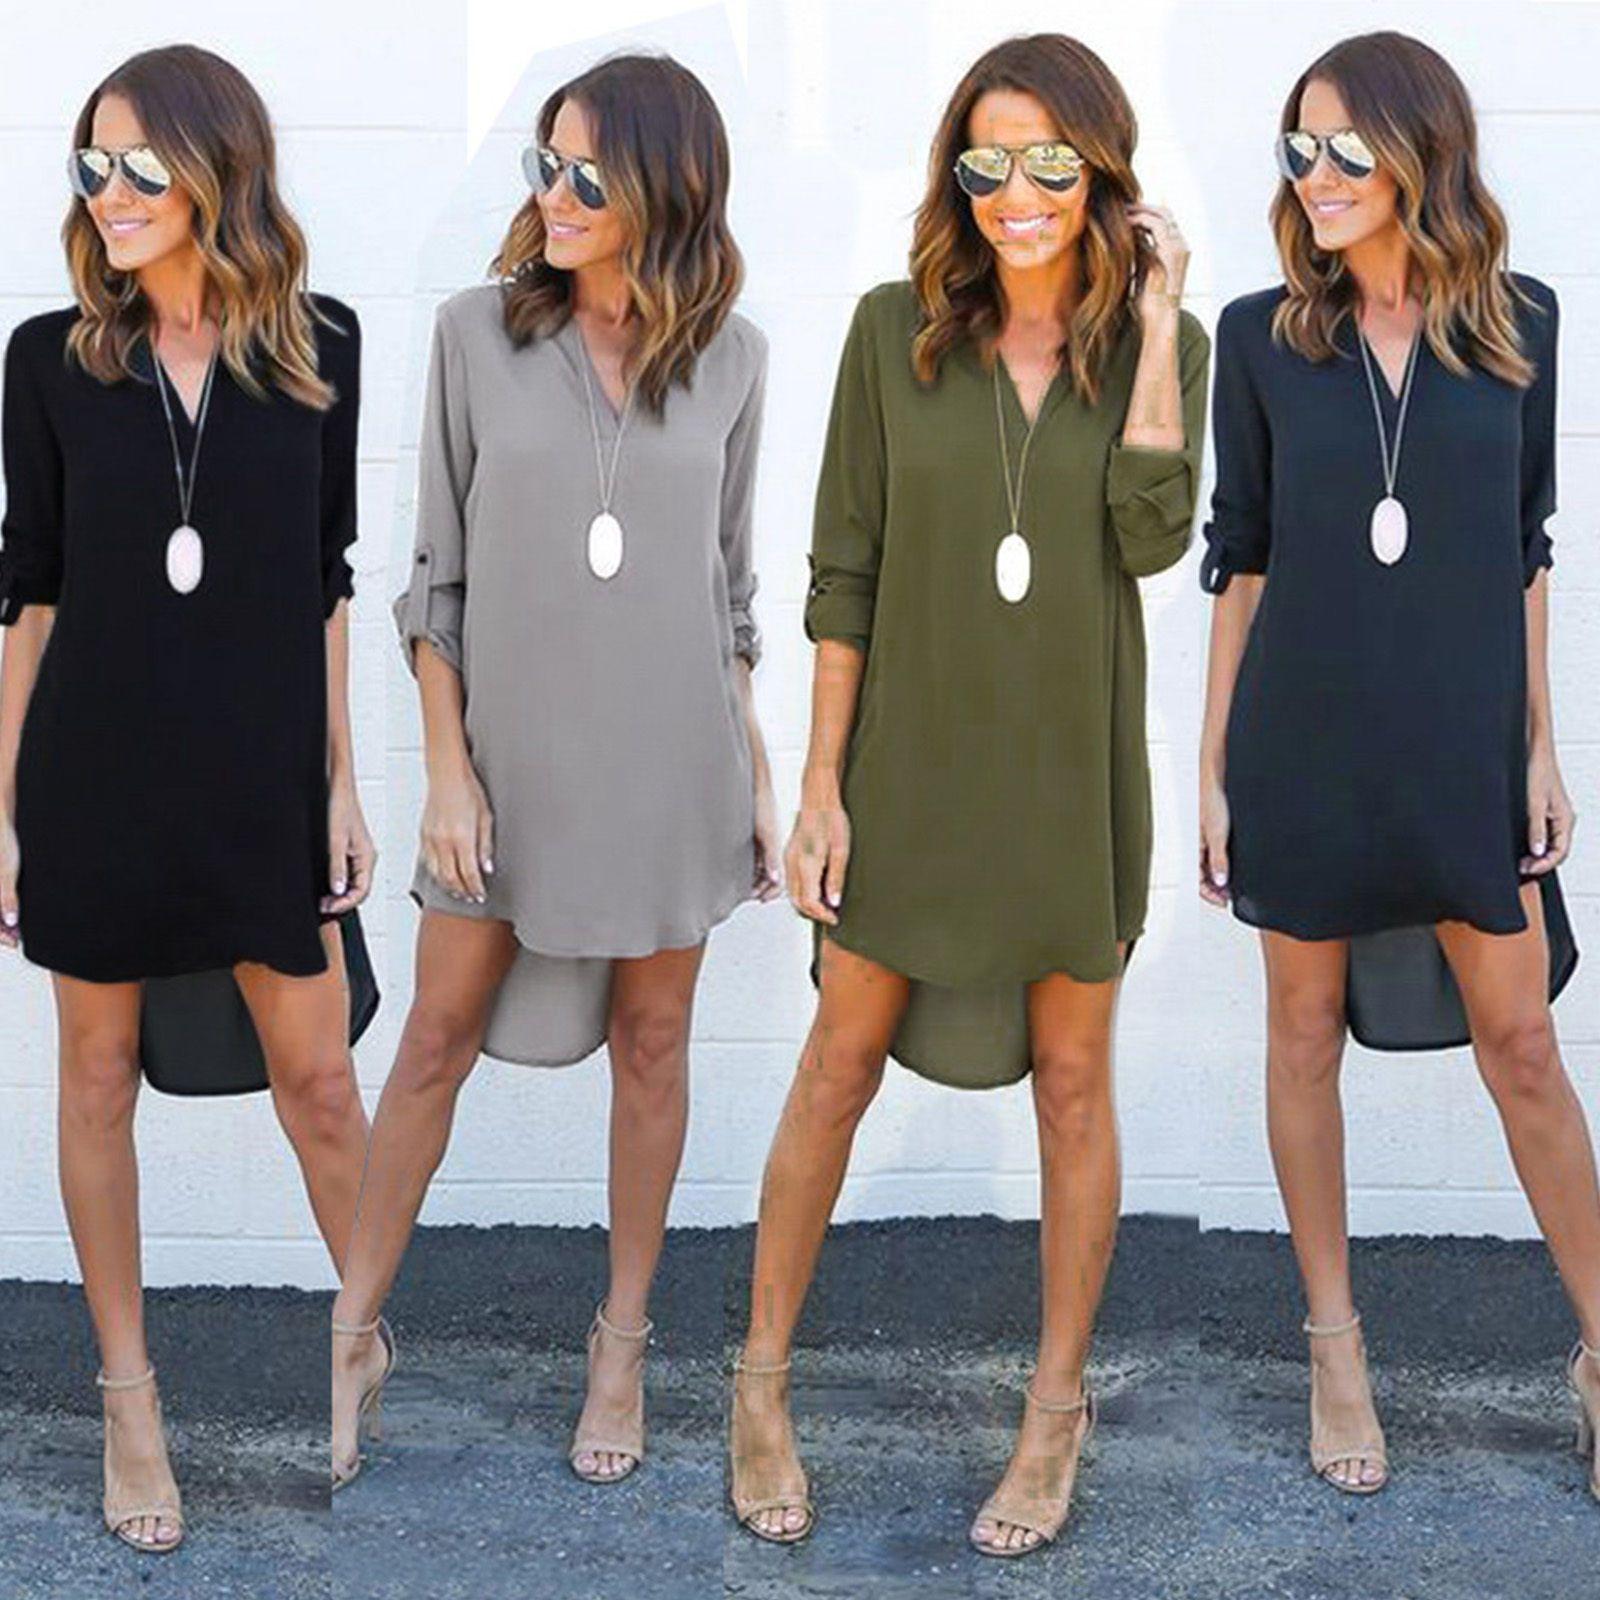 63193a16c0ef Womens Blouse Chiffon Long Sleeve Shirt Casual V Neck Loose Top Dress Plus  Size